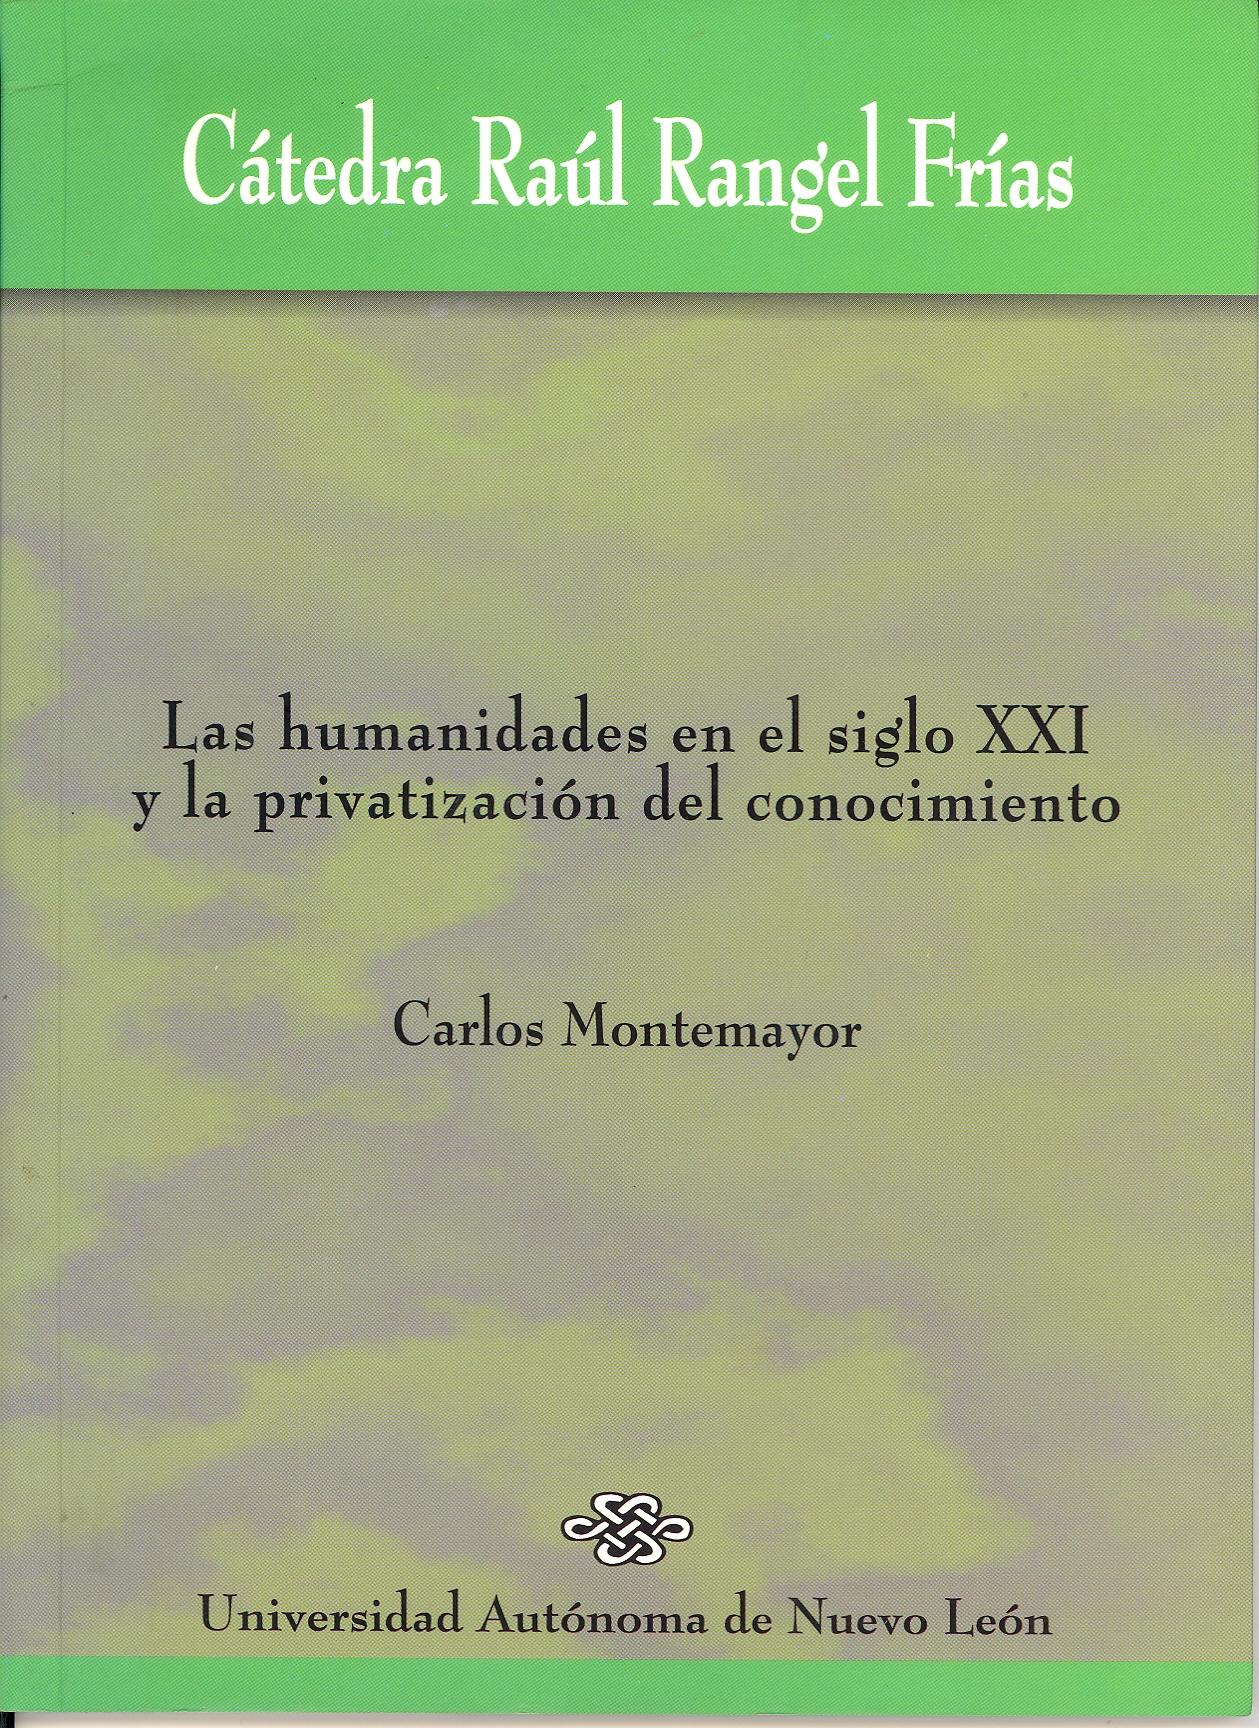 Catedra Raul Rangel Frias p.jpg